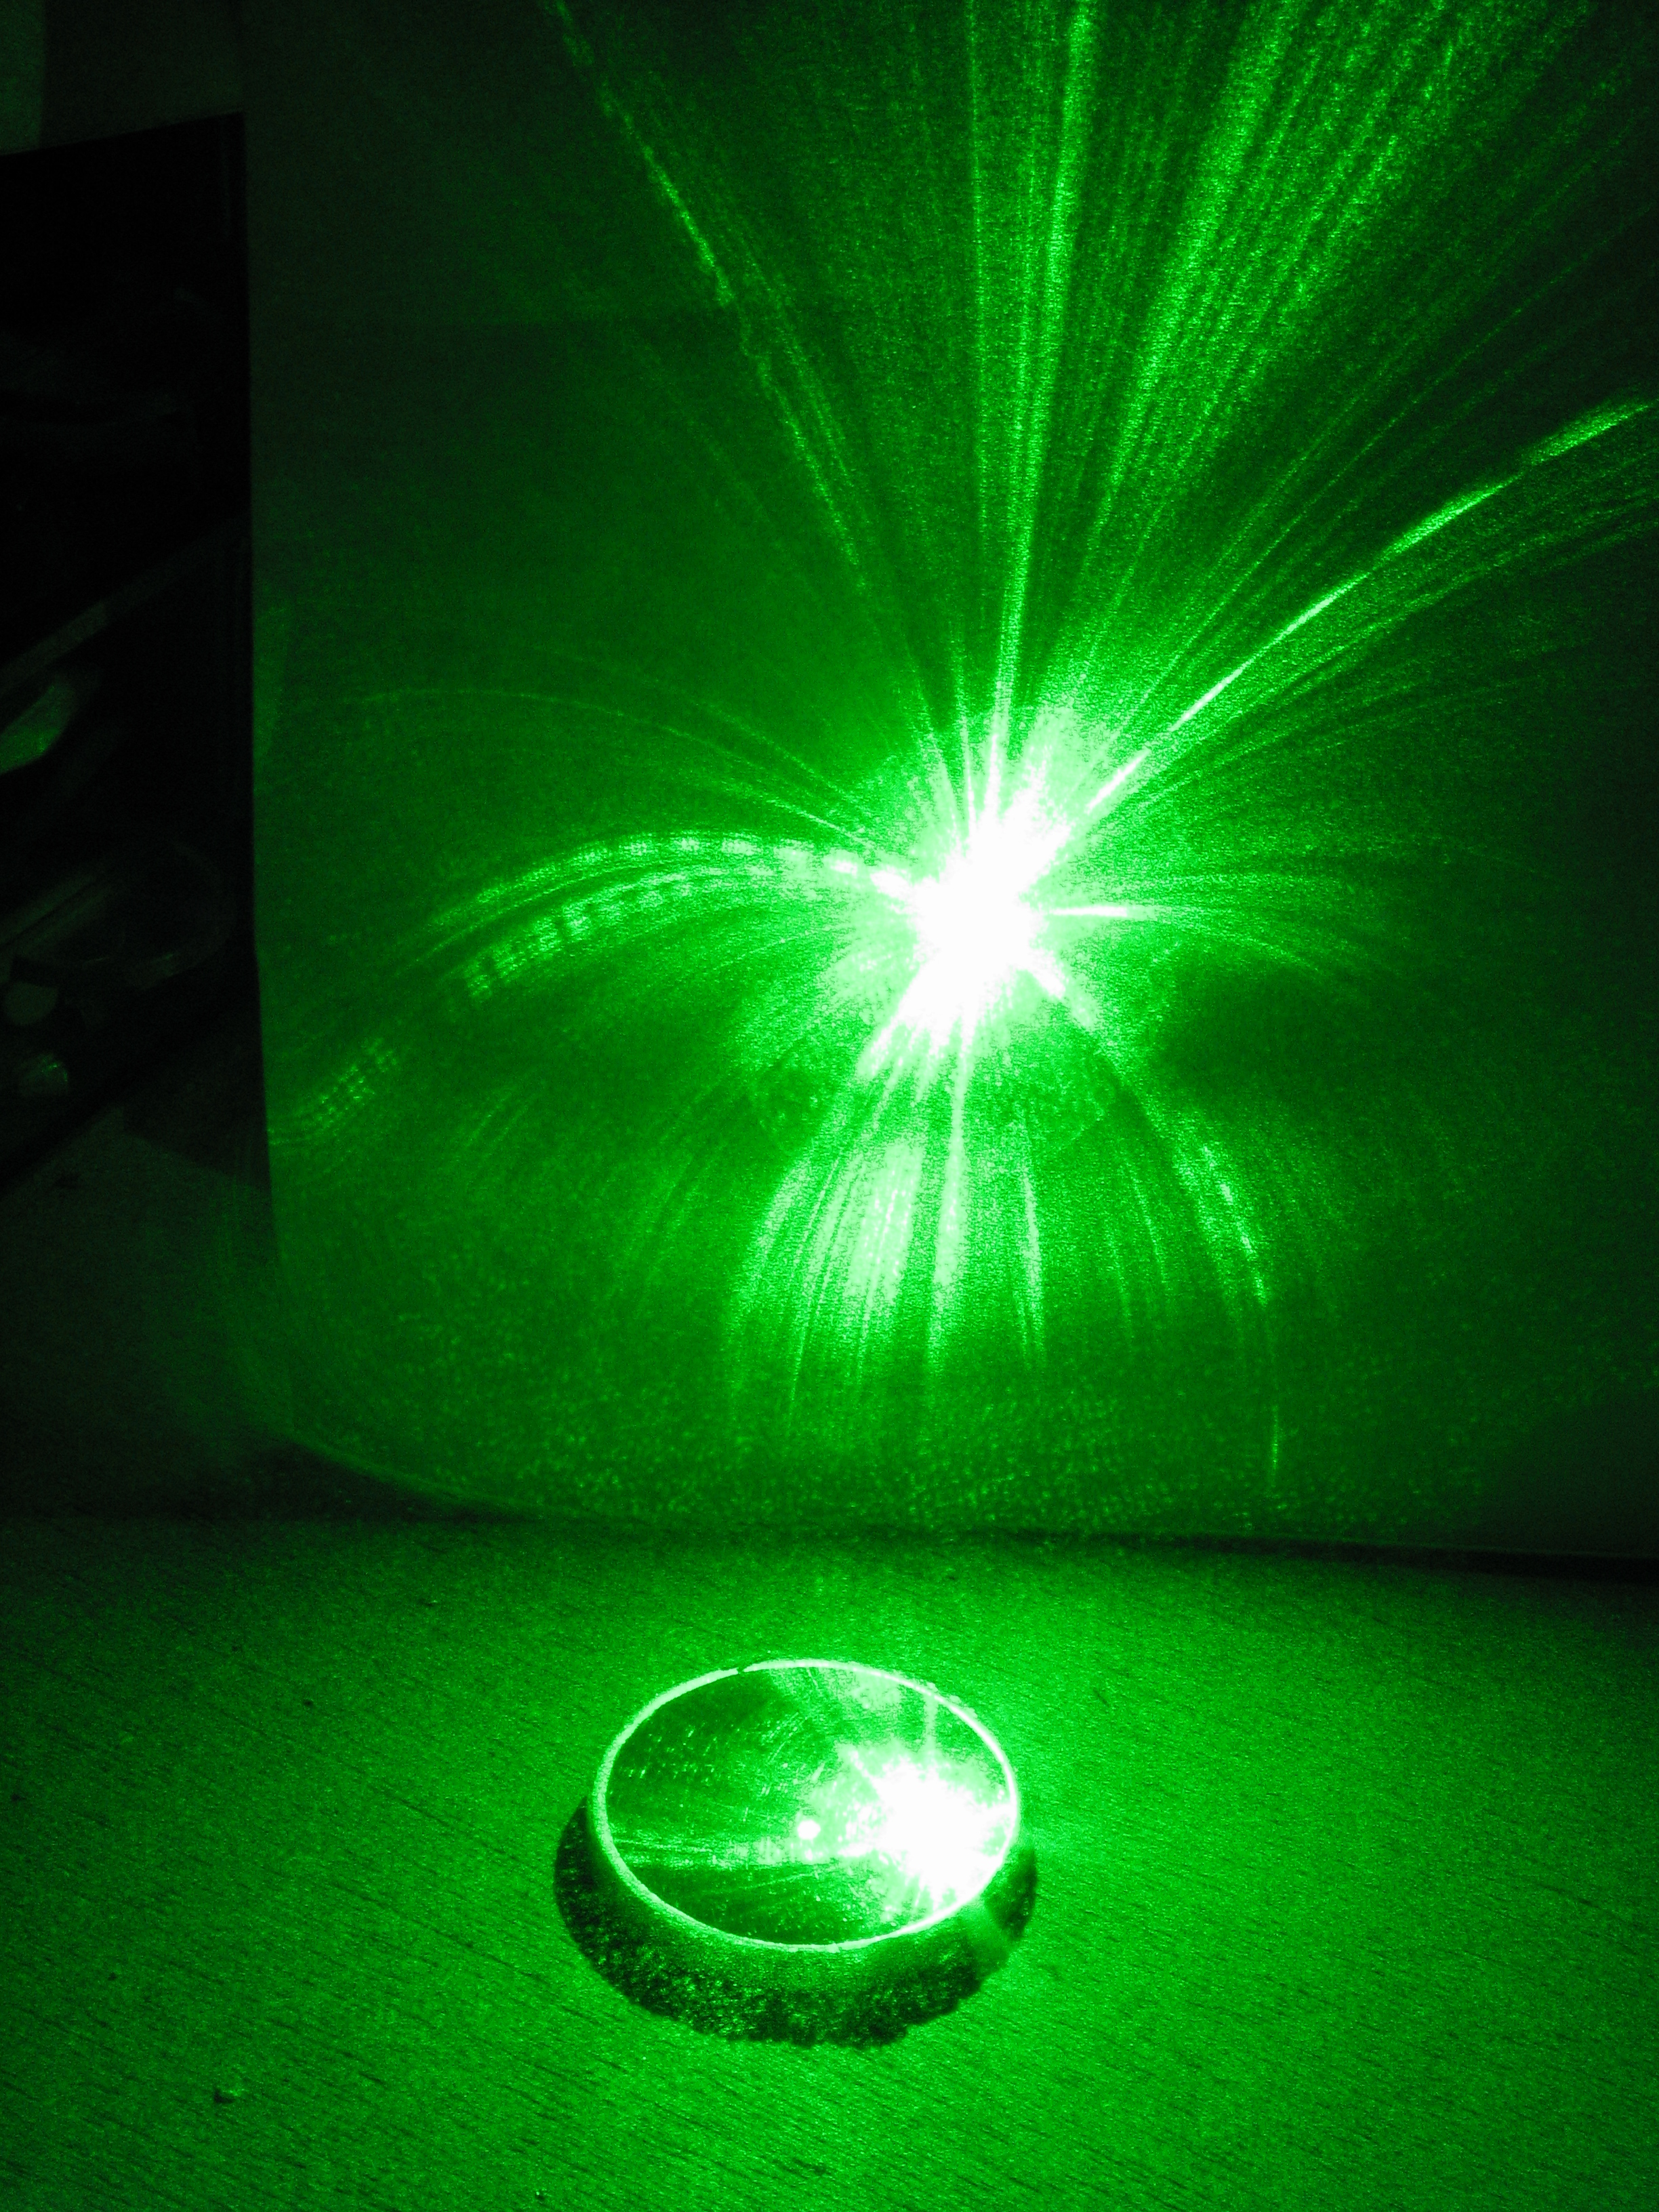 Get Your Laser Pointer 'Spot On'.